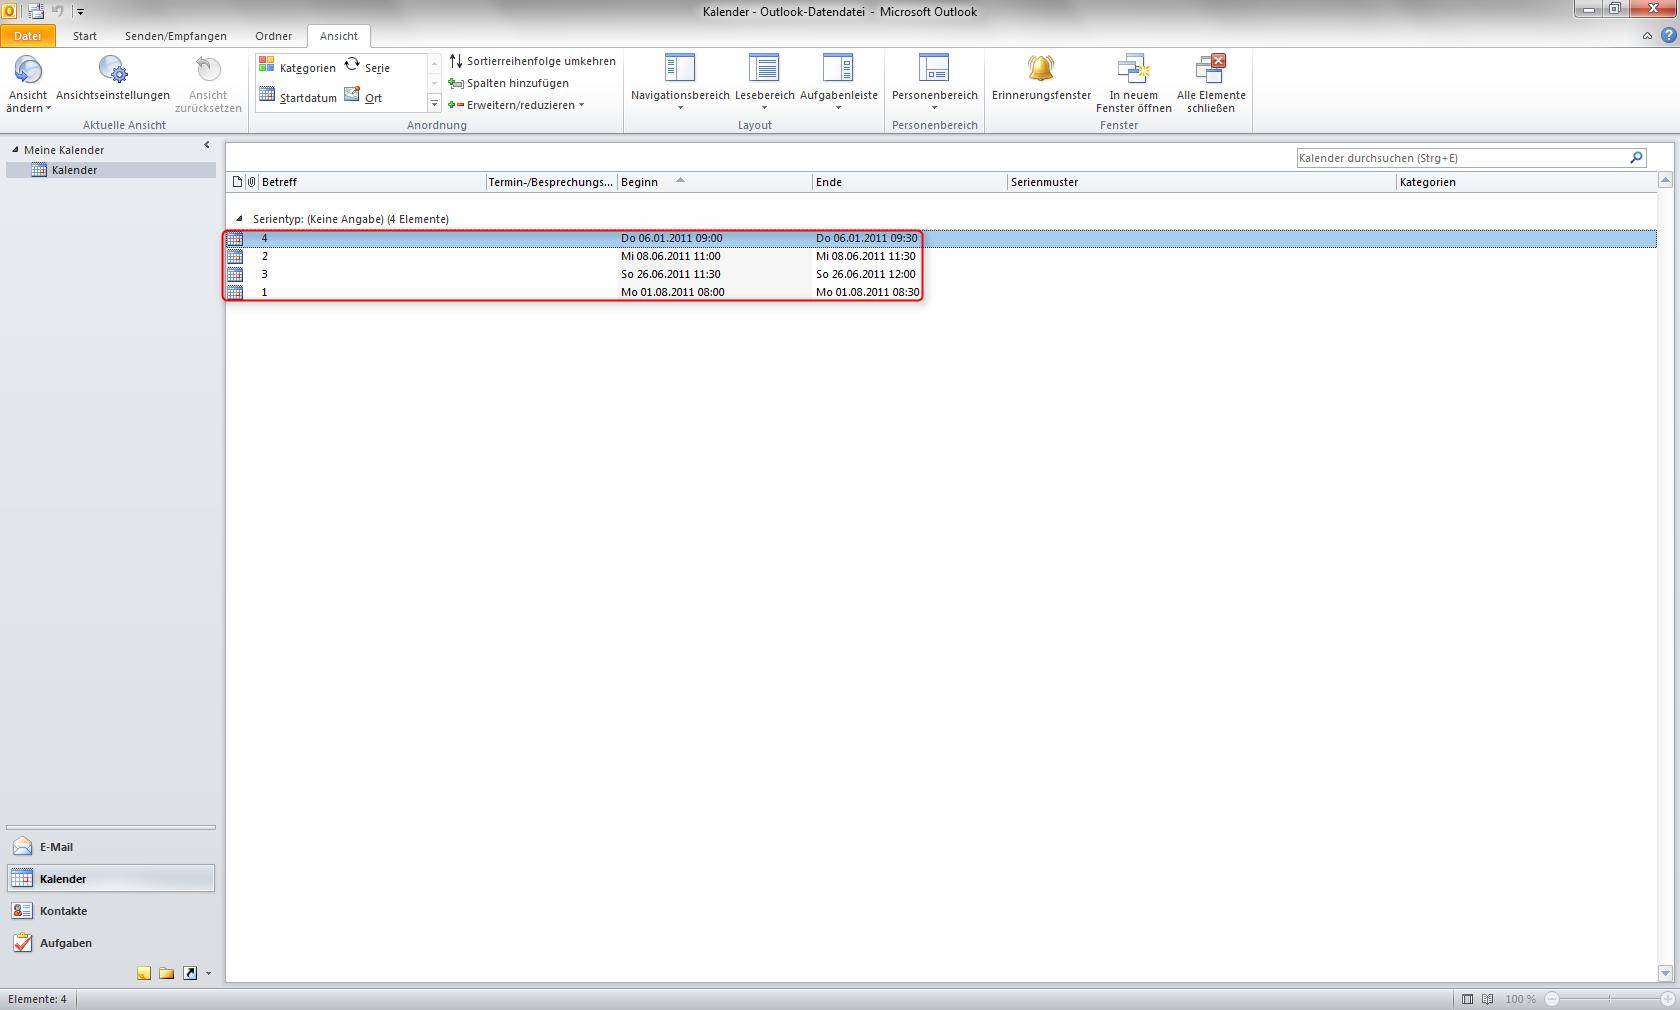 05-Outlook-2010-Kalendereintraege-entfernen-Liste-470.png?nocache=1312379540509